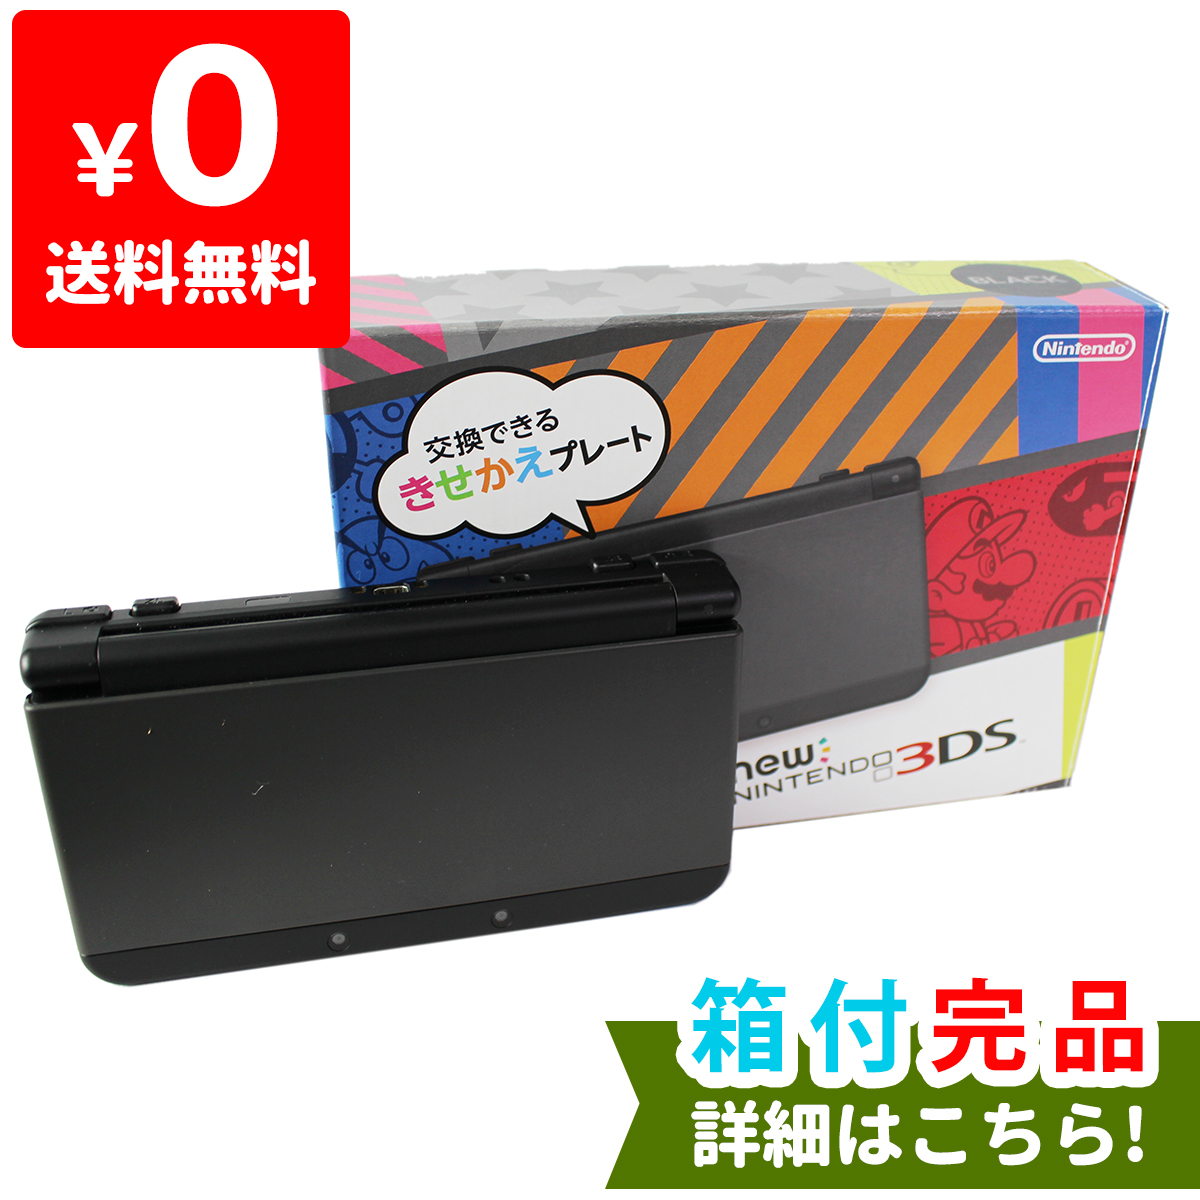 New3DS 本体 ブラック ニンテンドー 任天堂 Nintendo ゲーム機 【中古】 4902370522167 送料無料